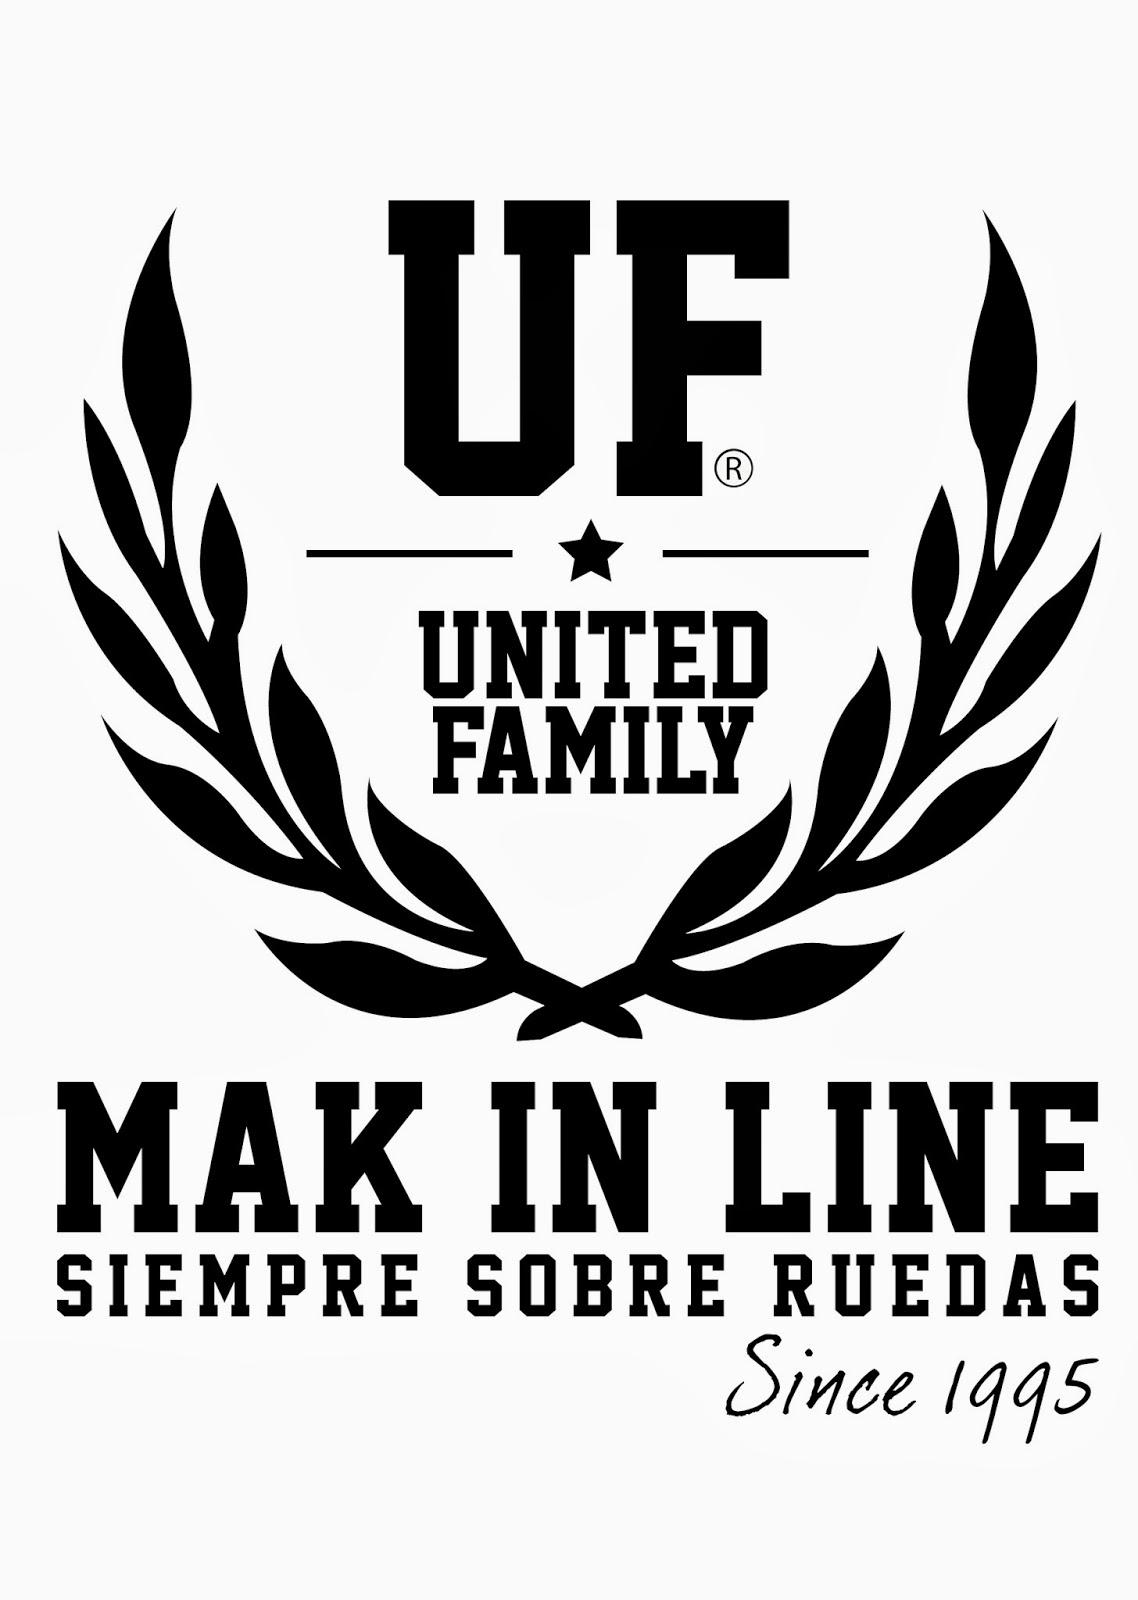 Mak In Line Roller Shop Uf United Family Calle Arjona 8 Sevilla Tlf 954 562 625 Mak In Line